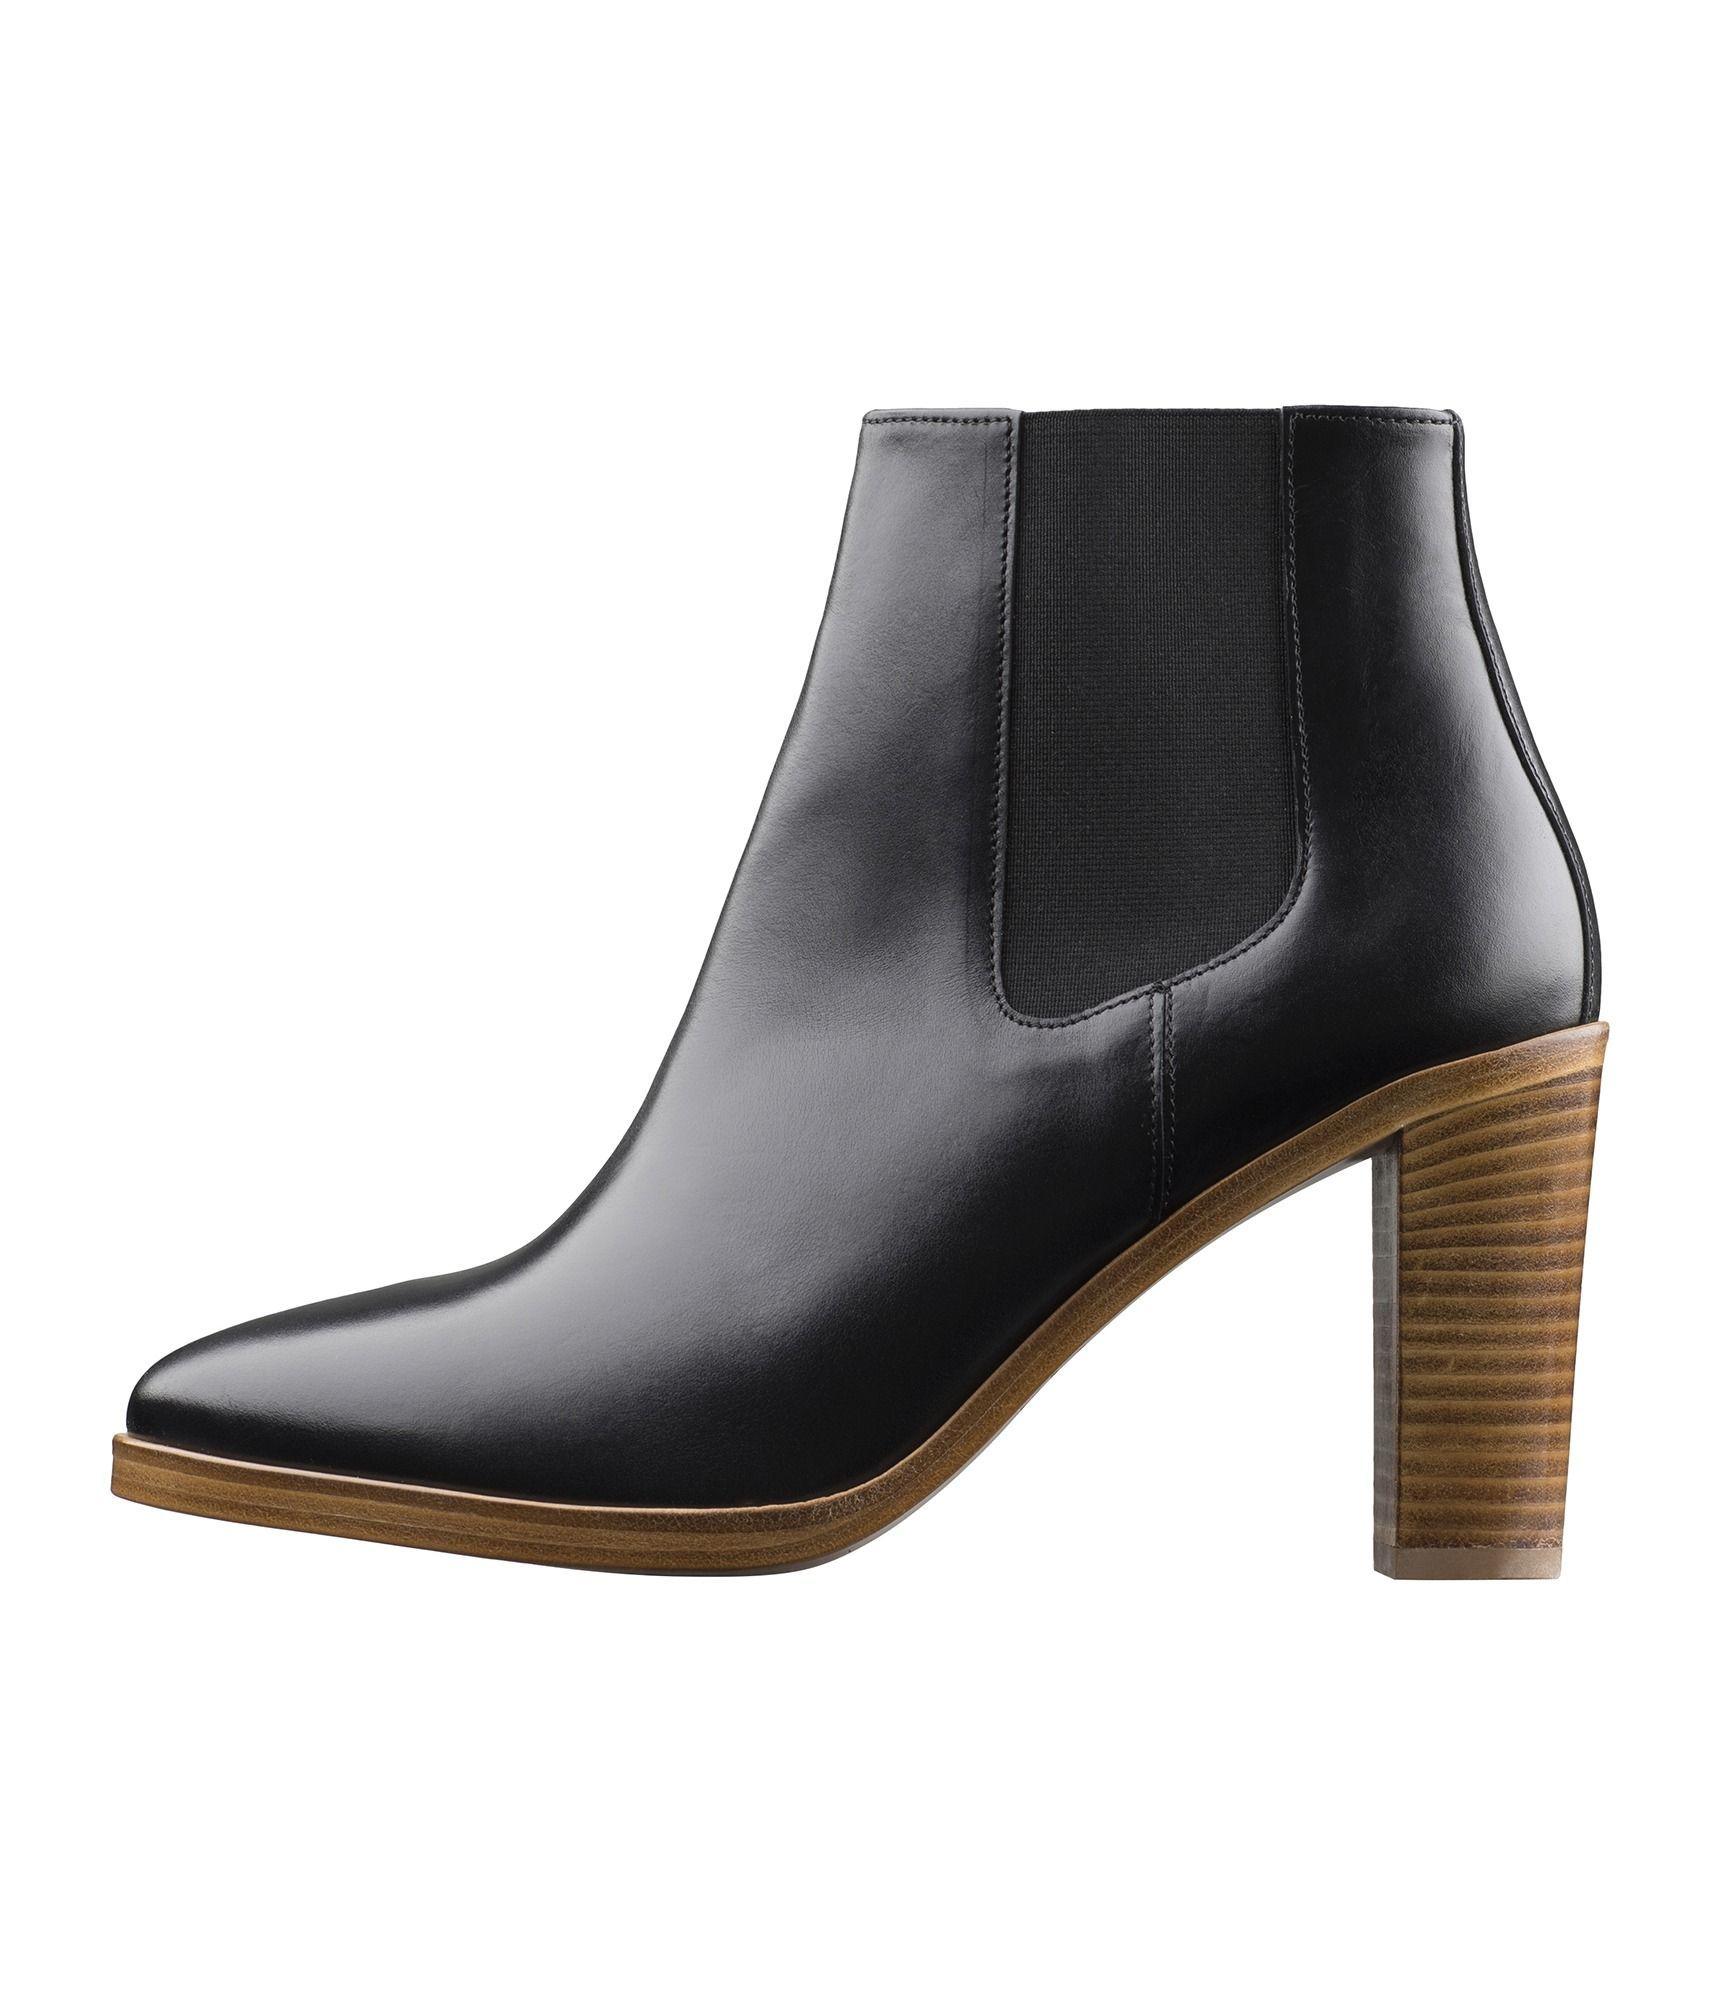 Boots femme cuir A.P.C.